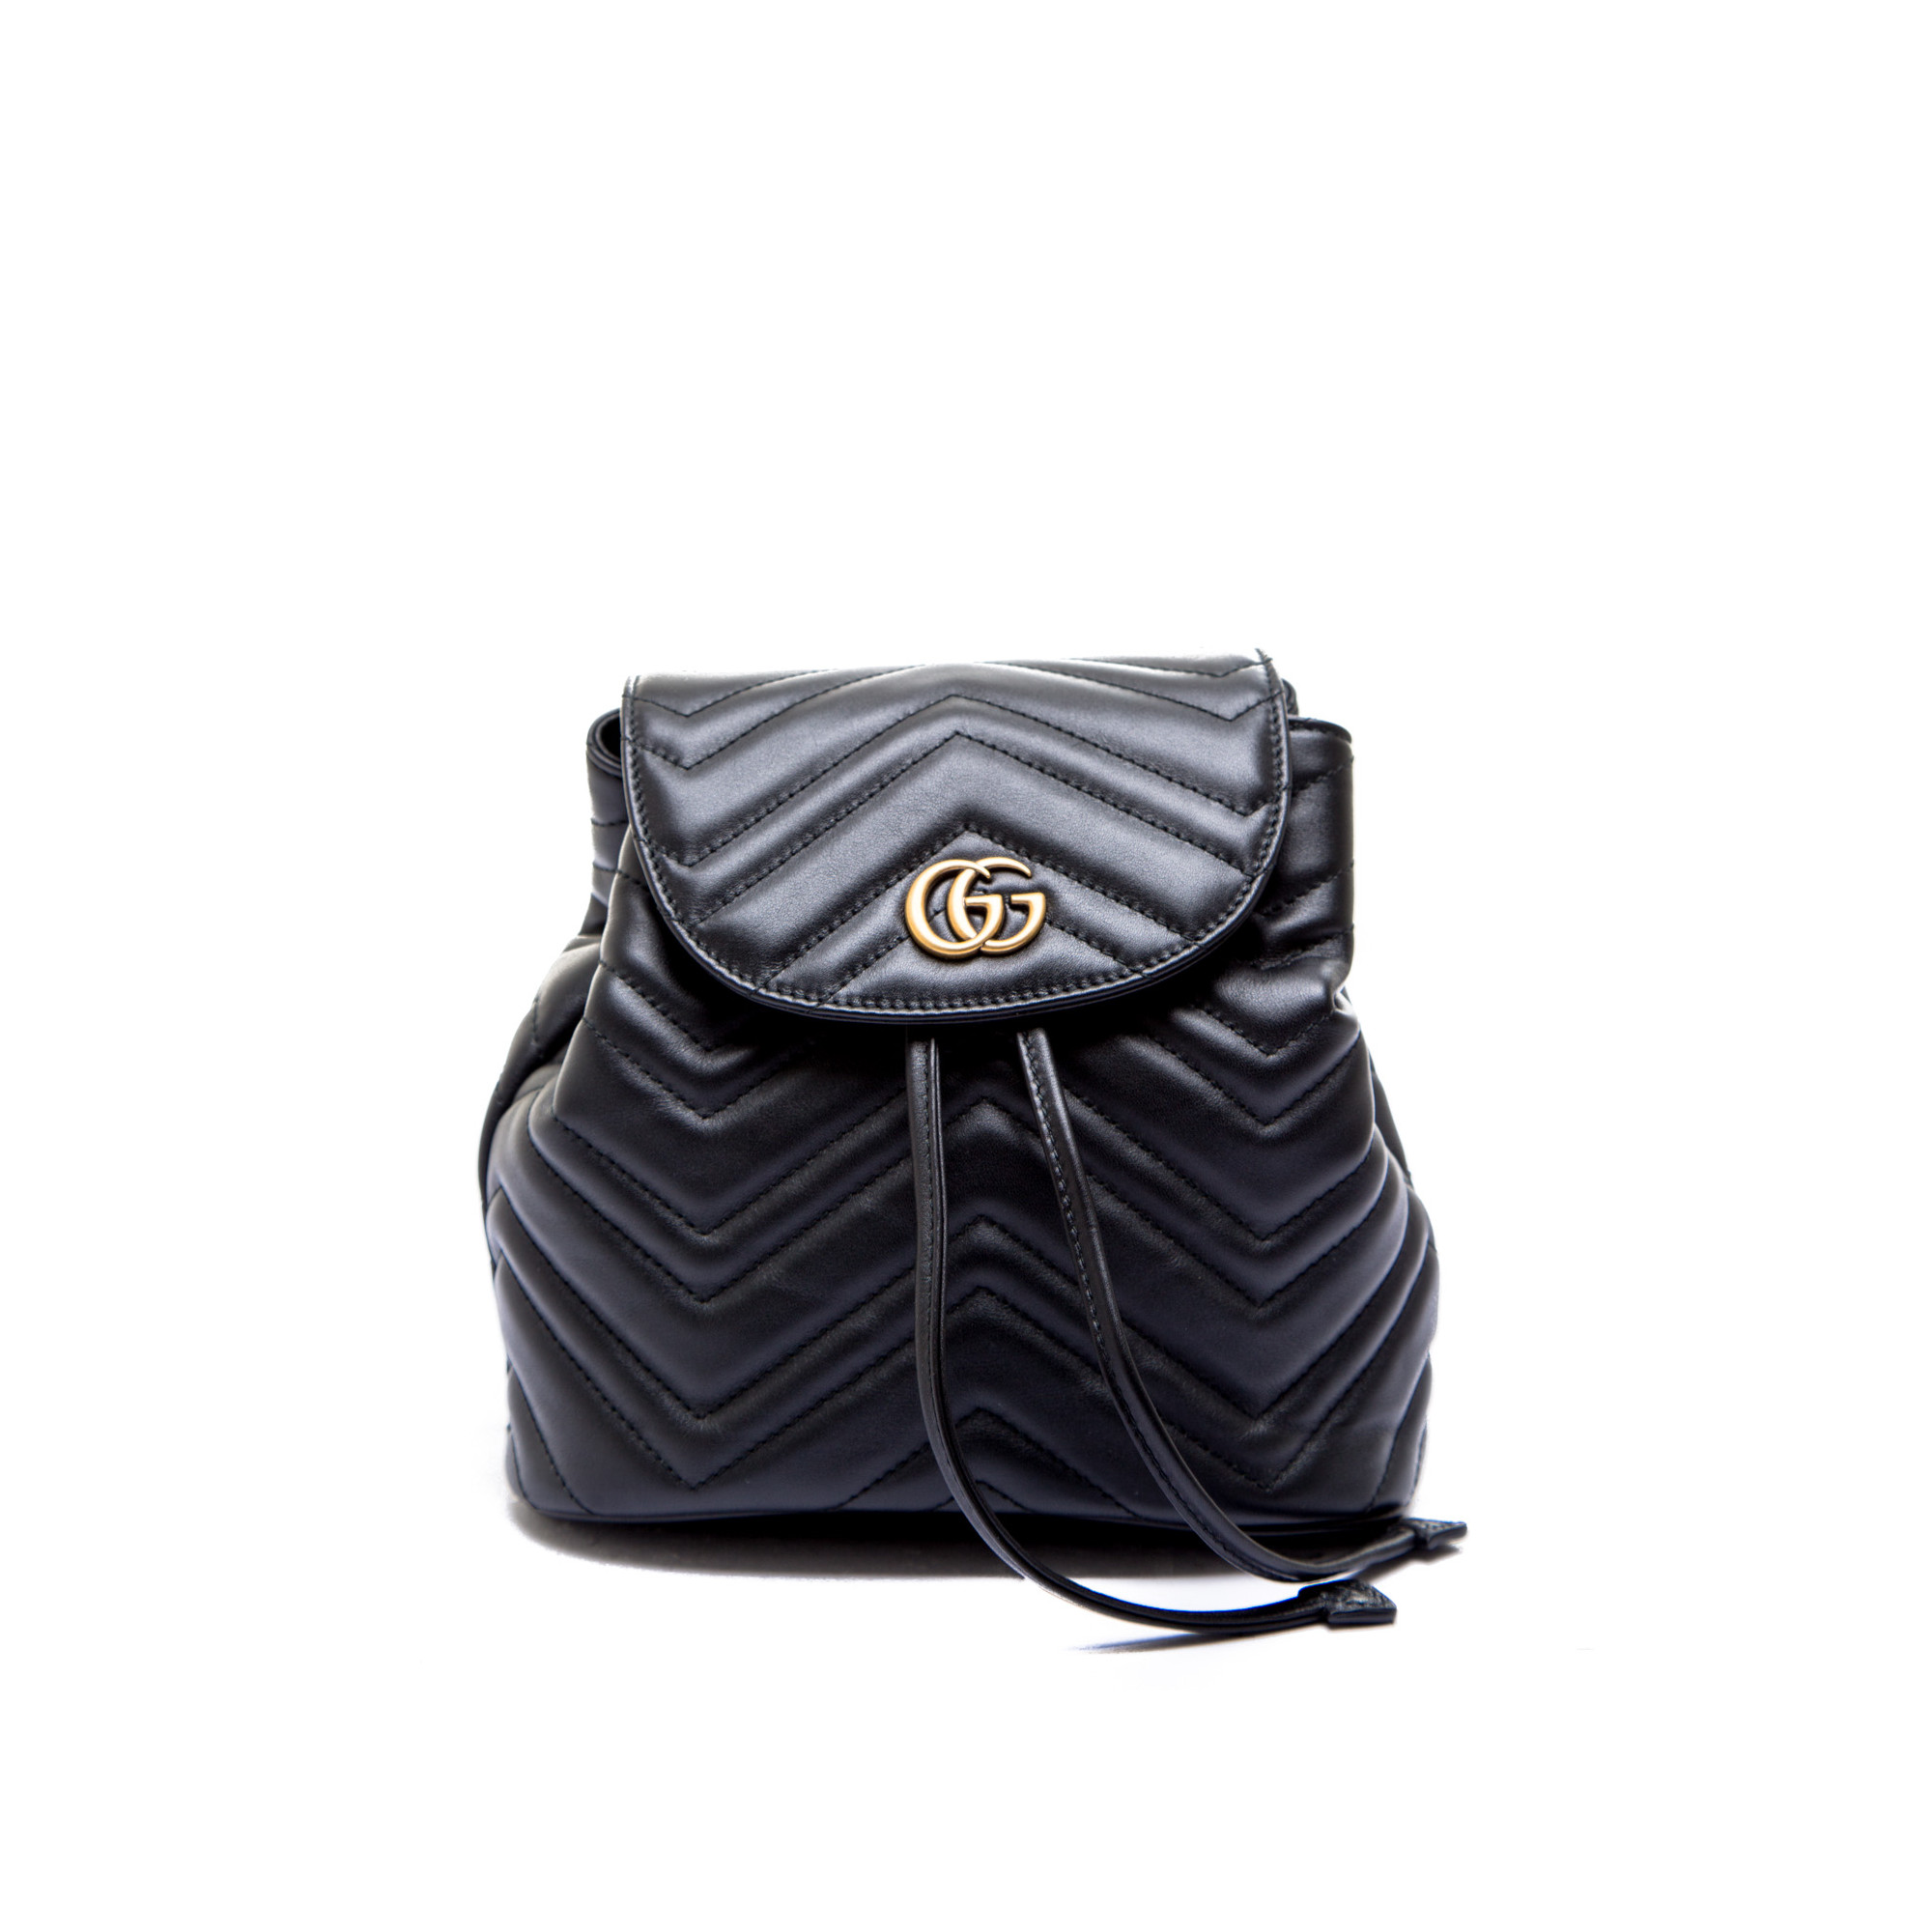 be3f2e55668 Bloomingdales Handbags Gucci - Style Guru  Fashion